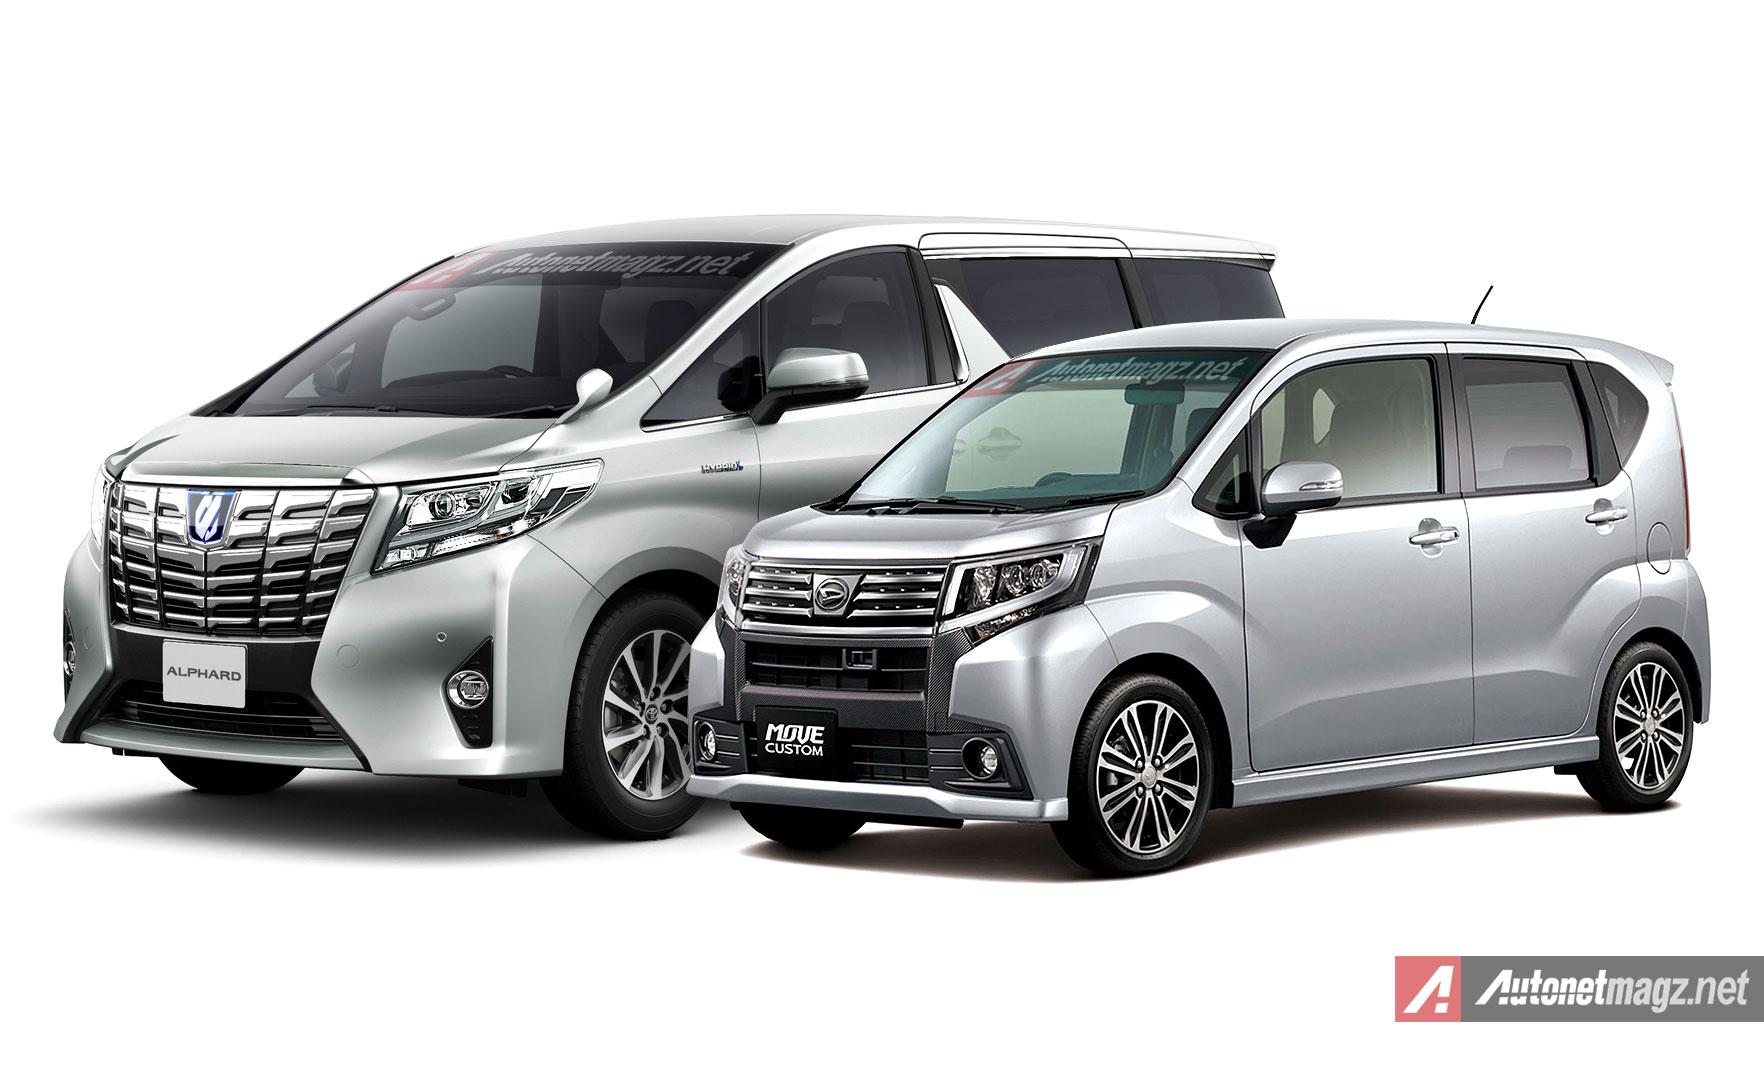 Daihatsu Move Custom 2015 Wajahnya Mirip Alphard Mini AutonetMagz